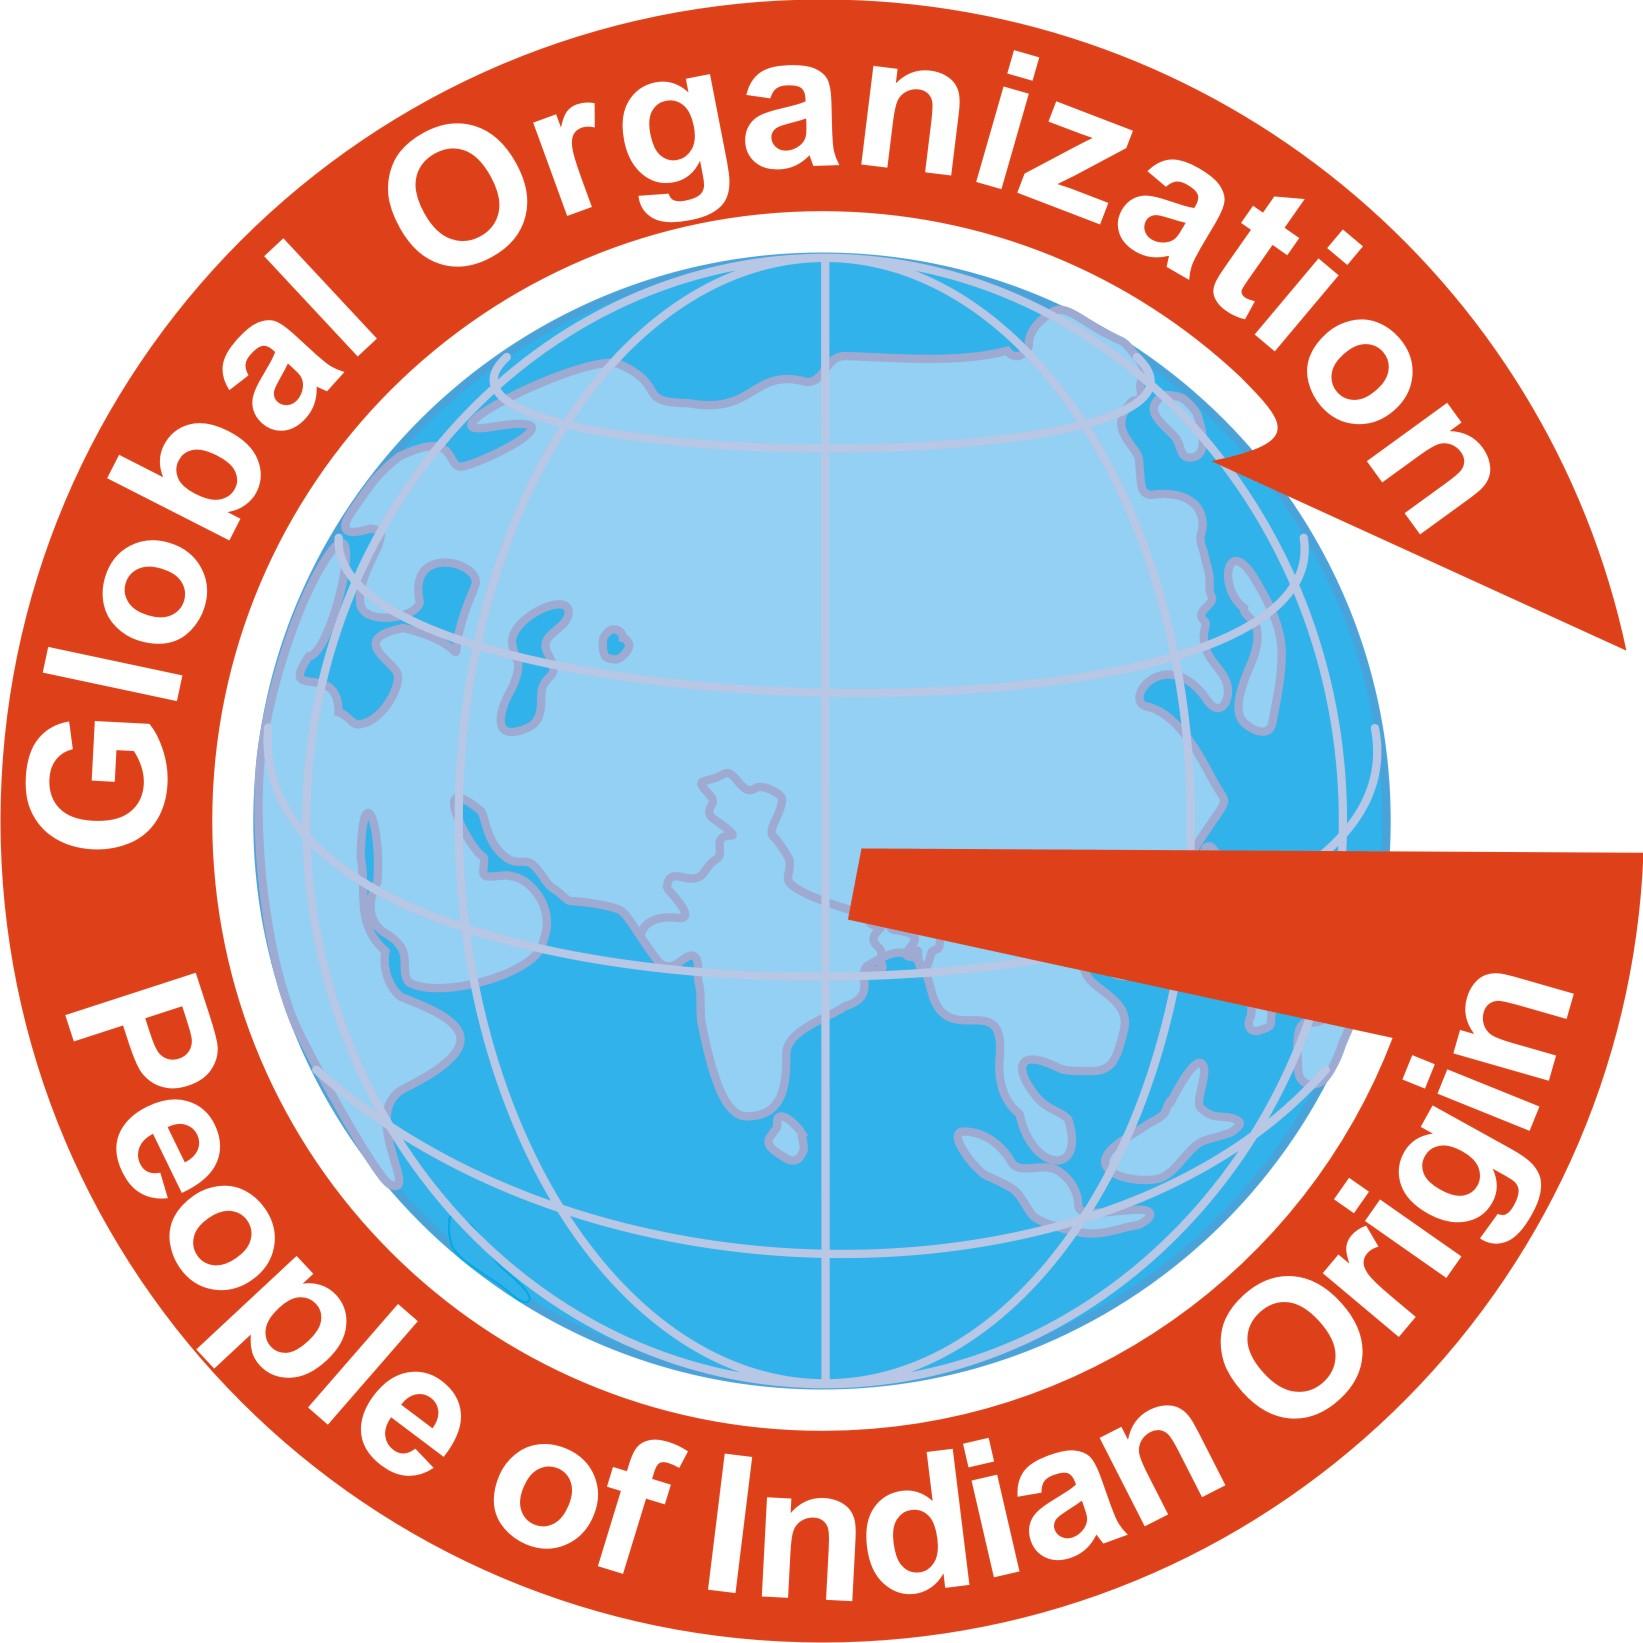 GOPIO International to launch New York chapter of International Chamber of Commerce